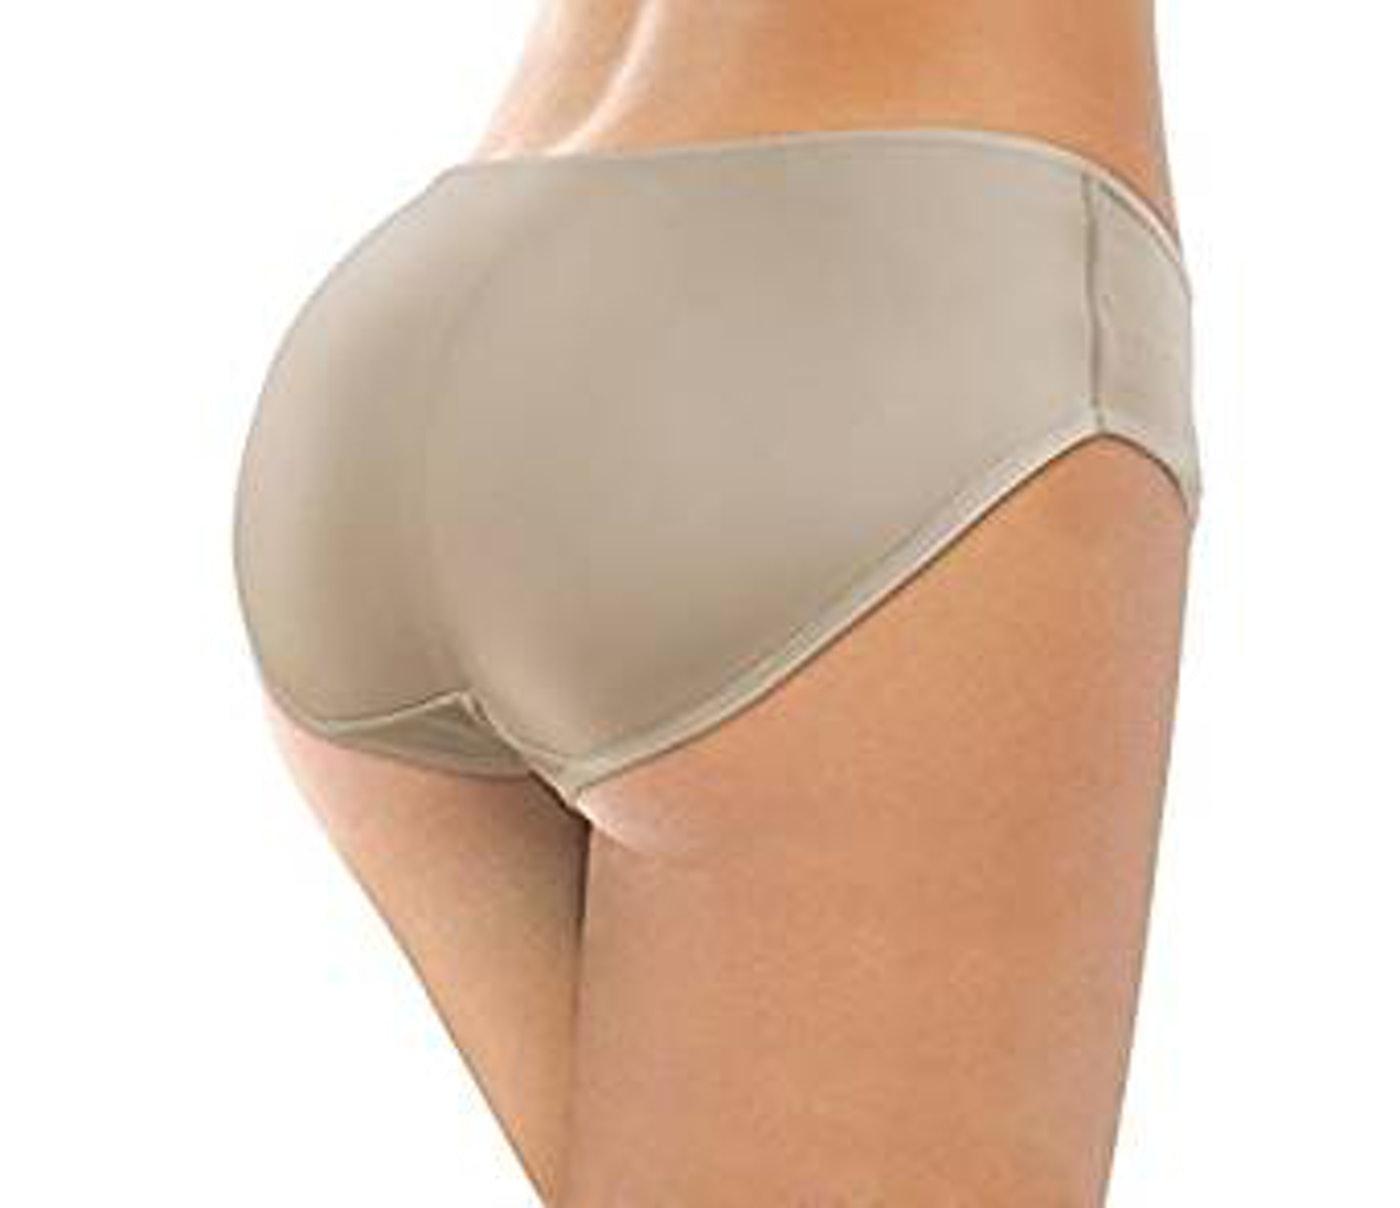 aef2b65eca4d 22 Weird But Genius Bras & Underwear You Won't Believe People Are Buying On  Amazon